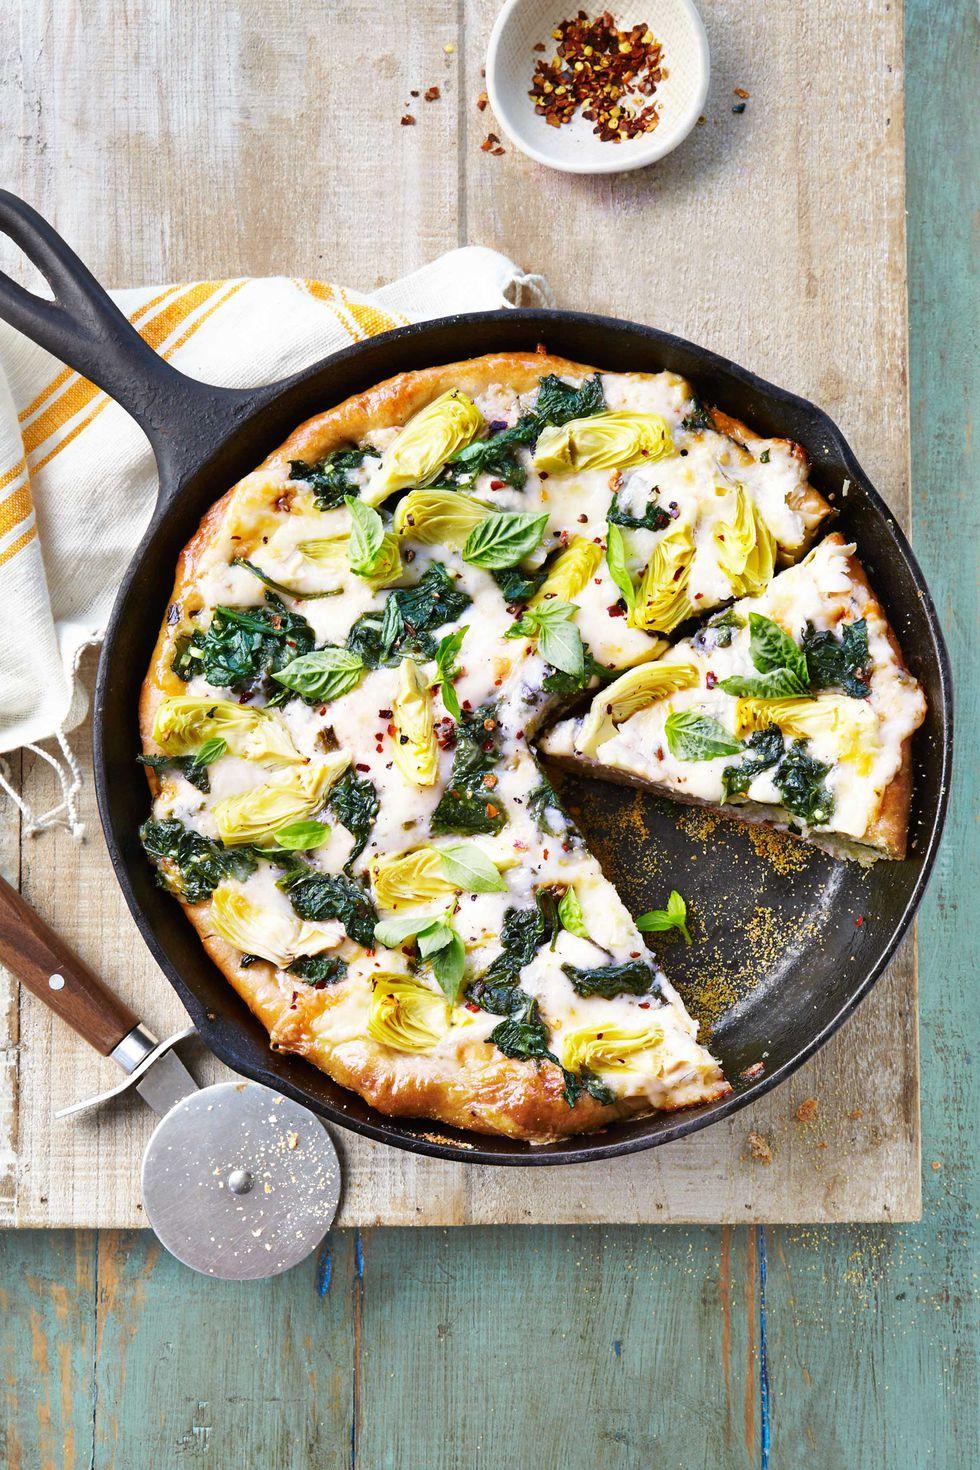 10 ONE Pan Meals| One Pan Meals, One Pan Dinner, One Pan Dinner Recipes, One Pan Meals Healthy